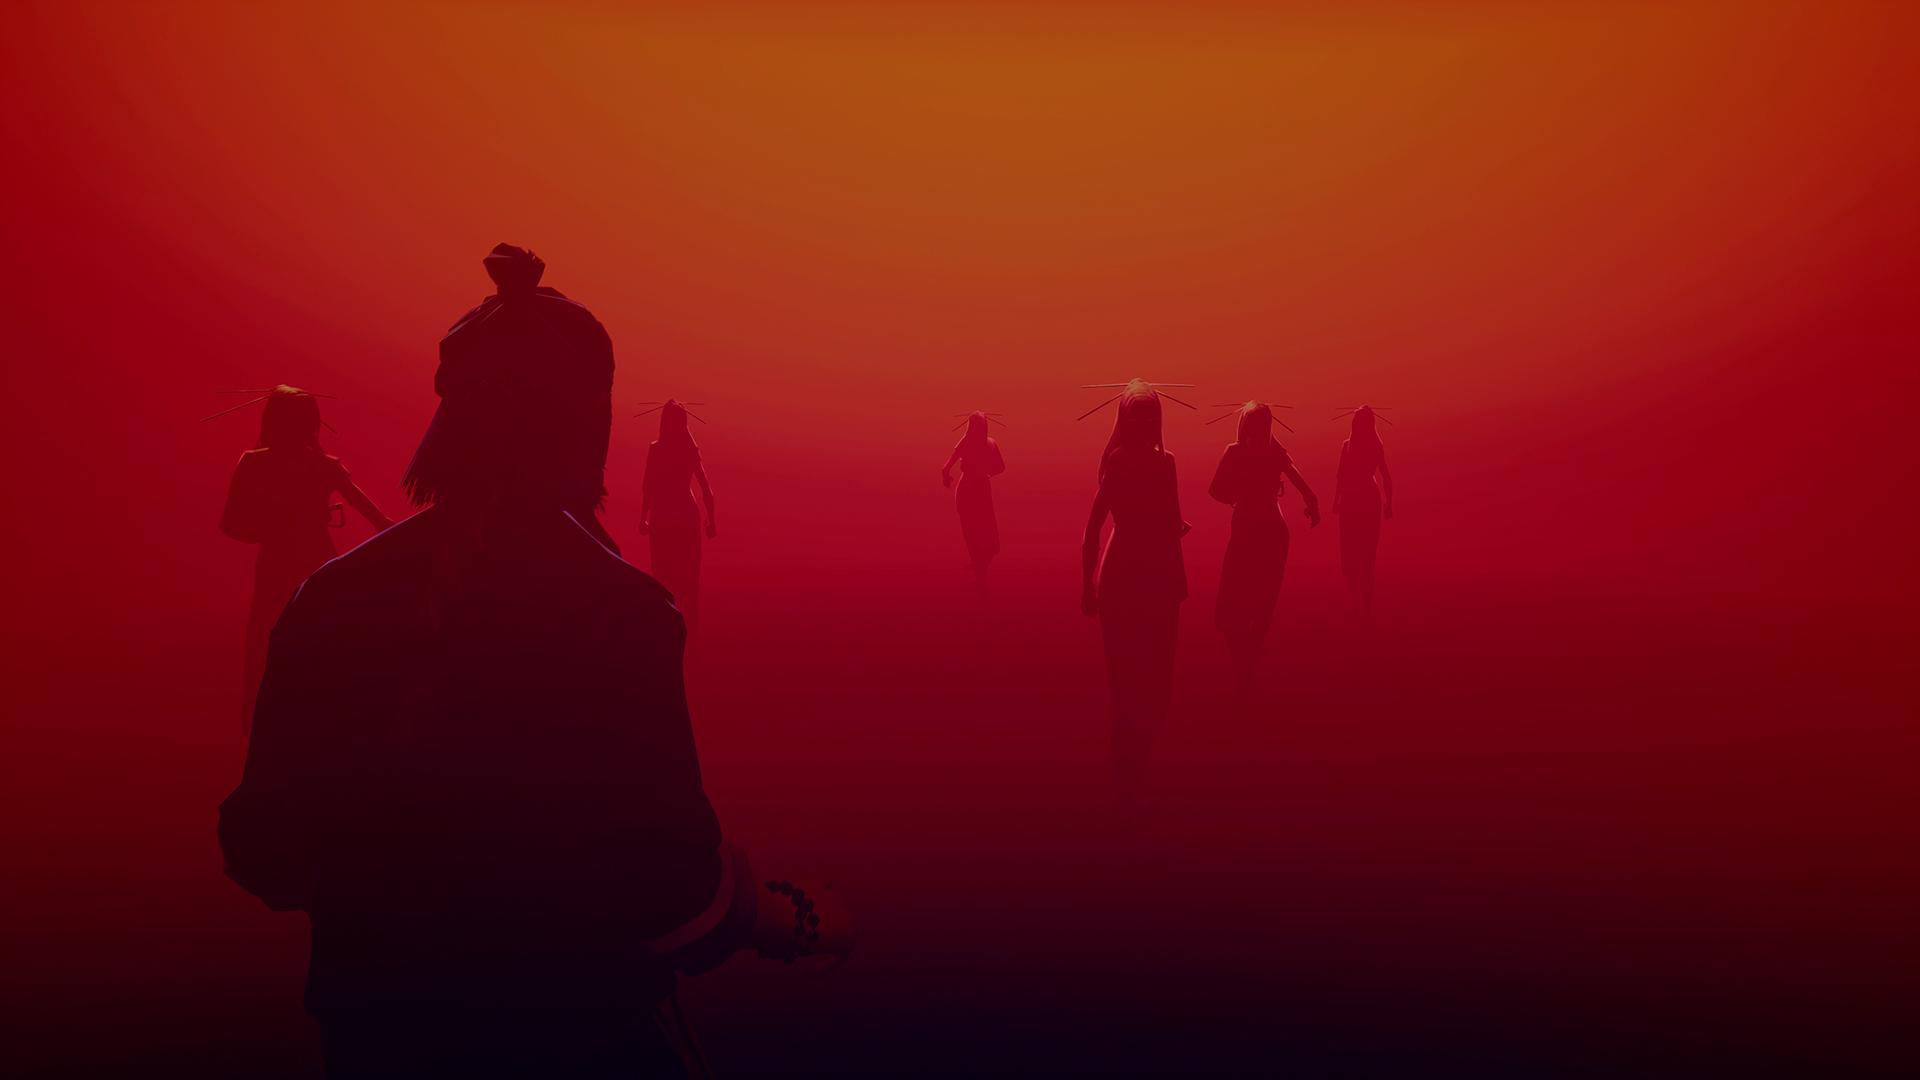 SIFU_Reveal_Screenshot_1920x1080_Fog